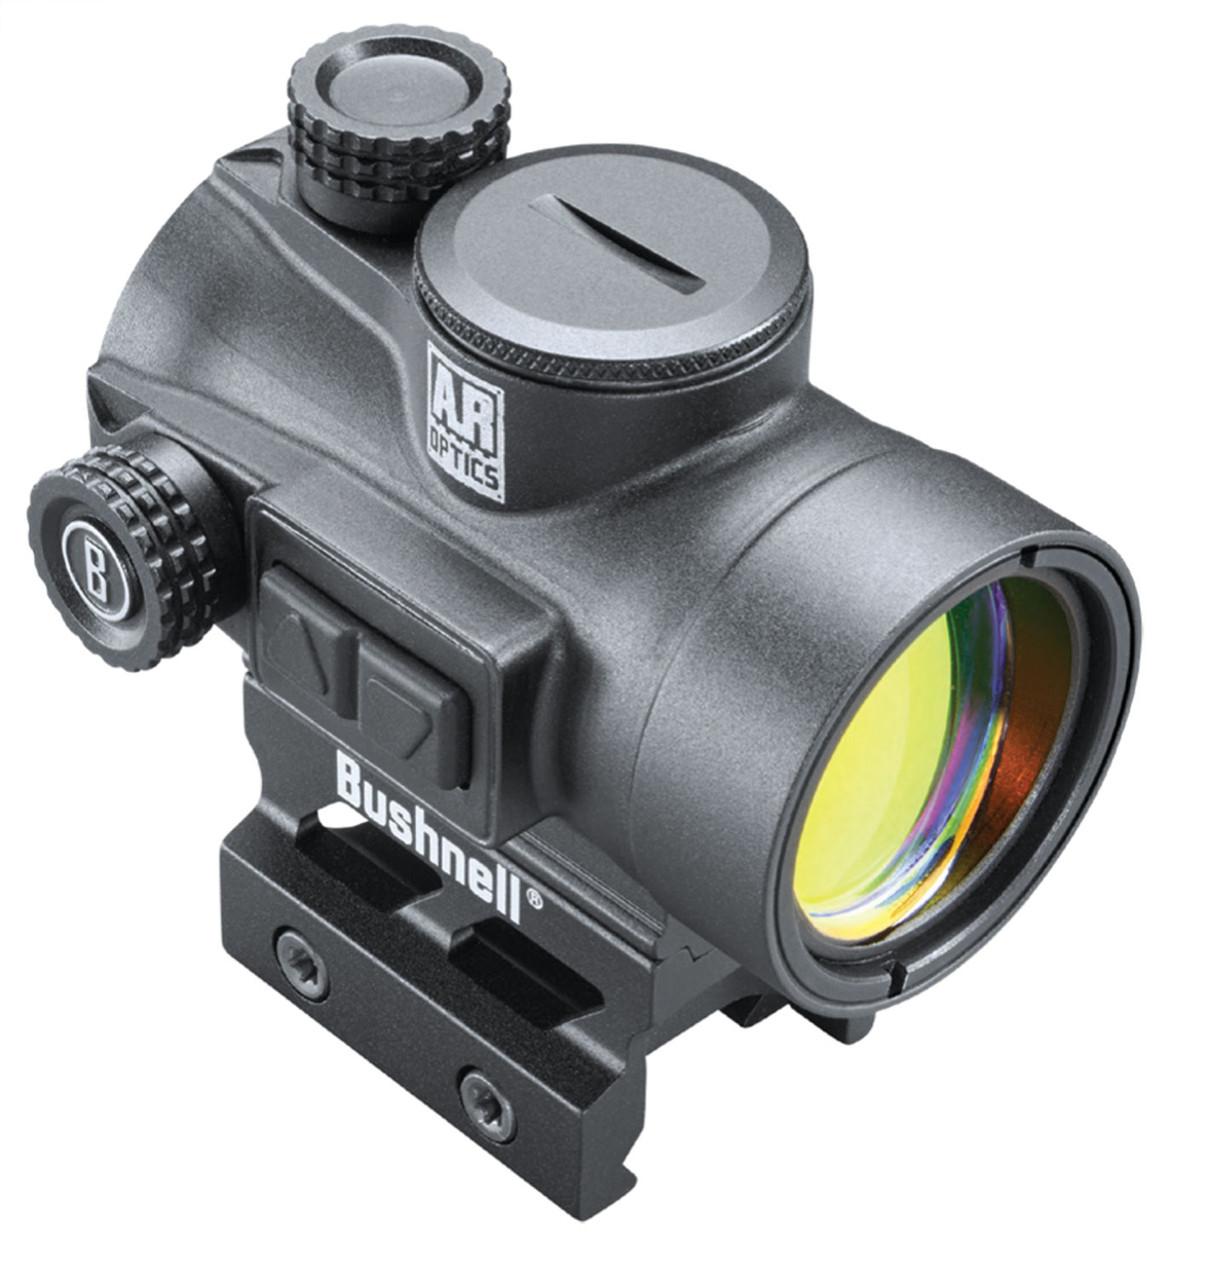 Bushnell AR Optics TRS-26 1x